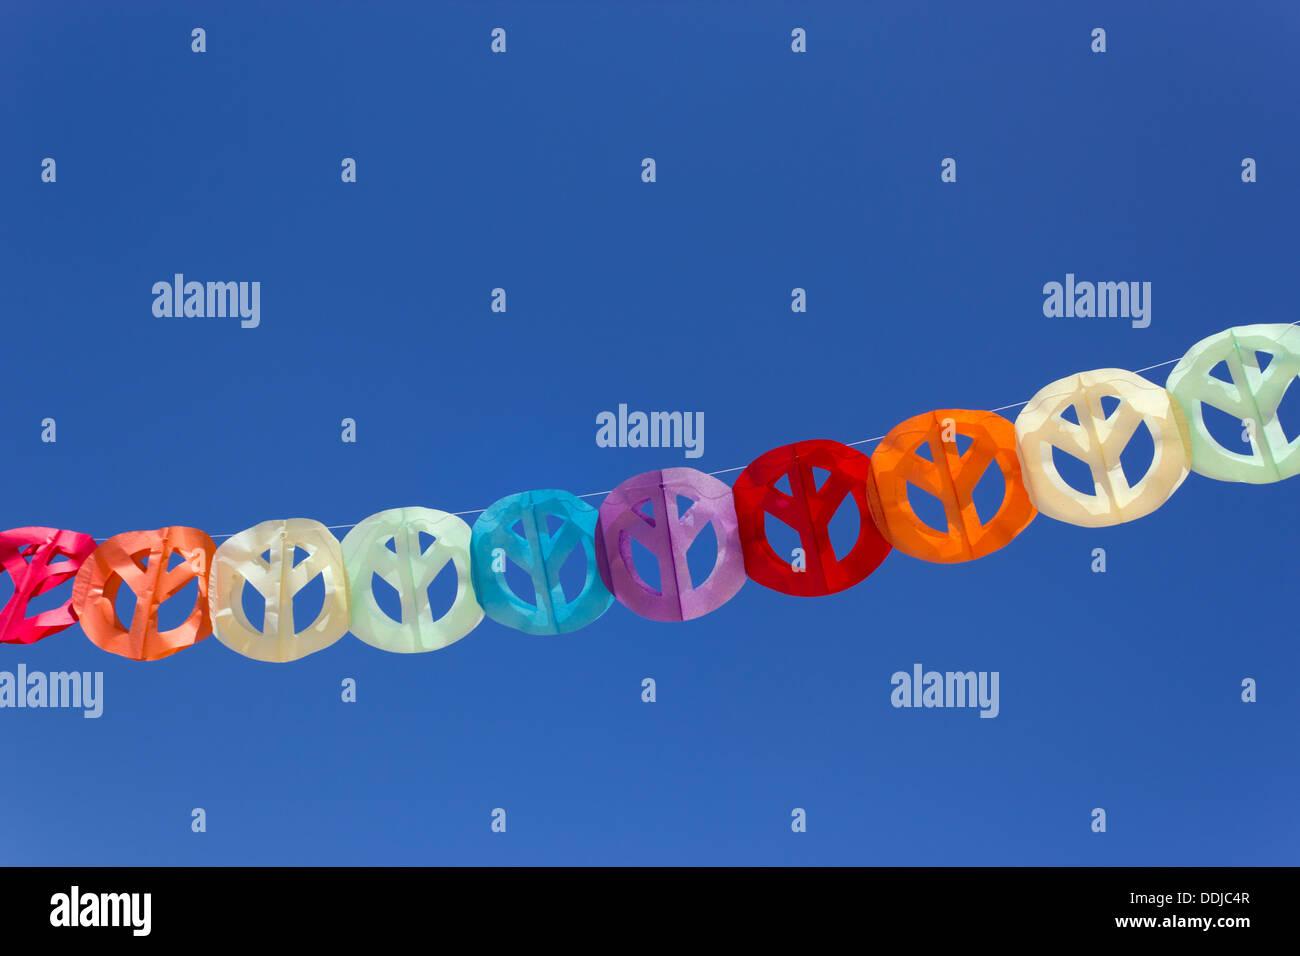 Papier Girlande aus bunten Peace-Zeichen gegen blauen Himmel. Stockbild